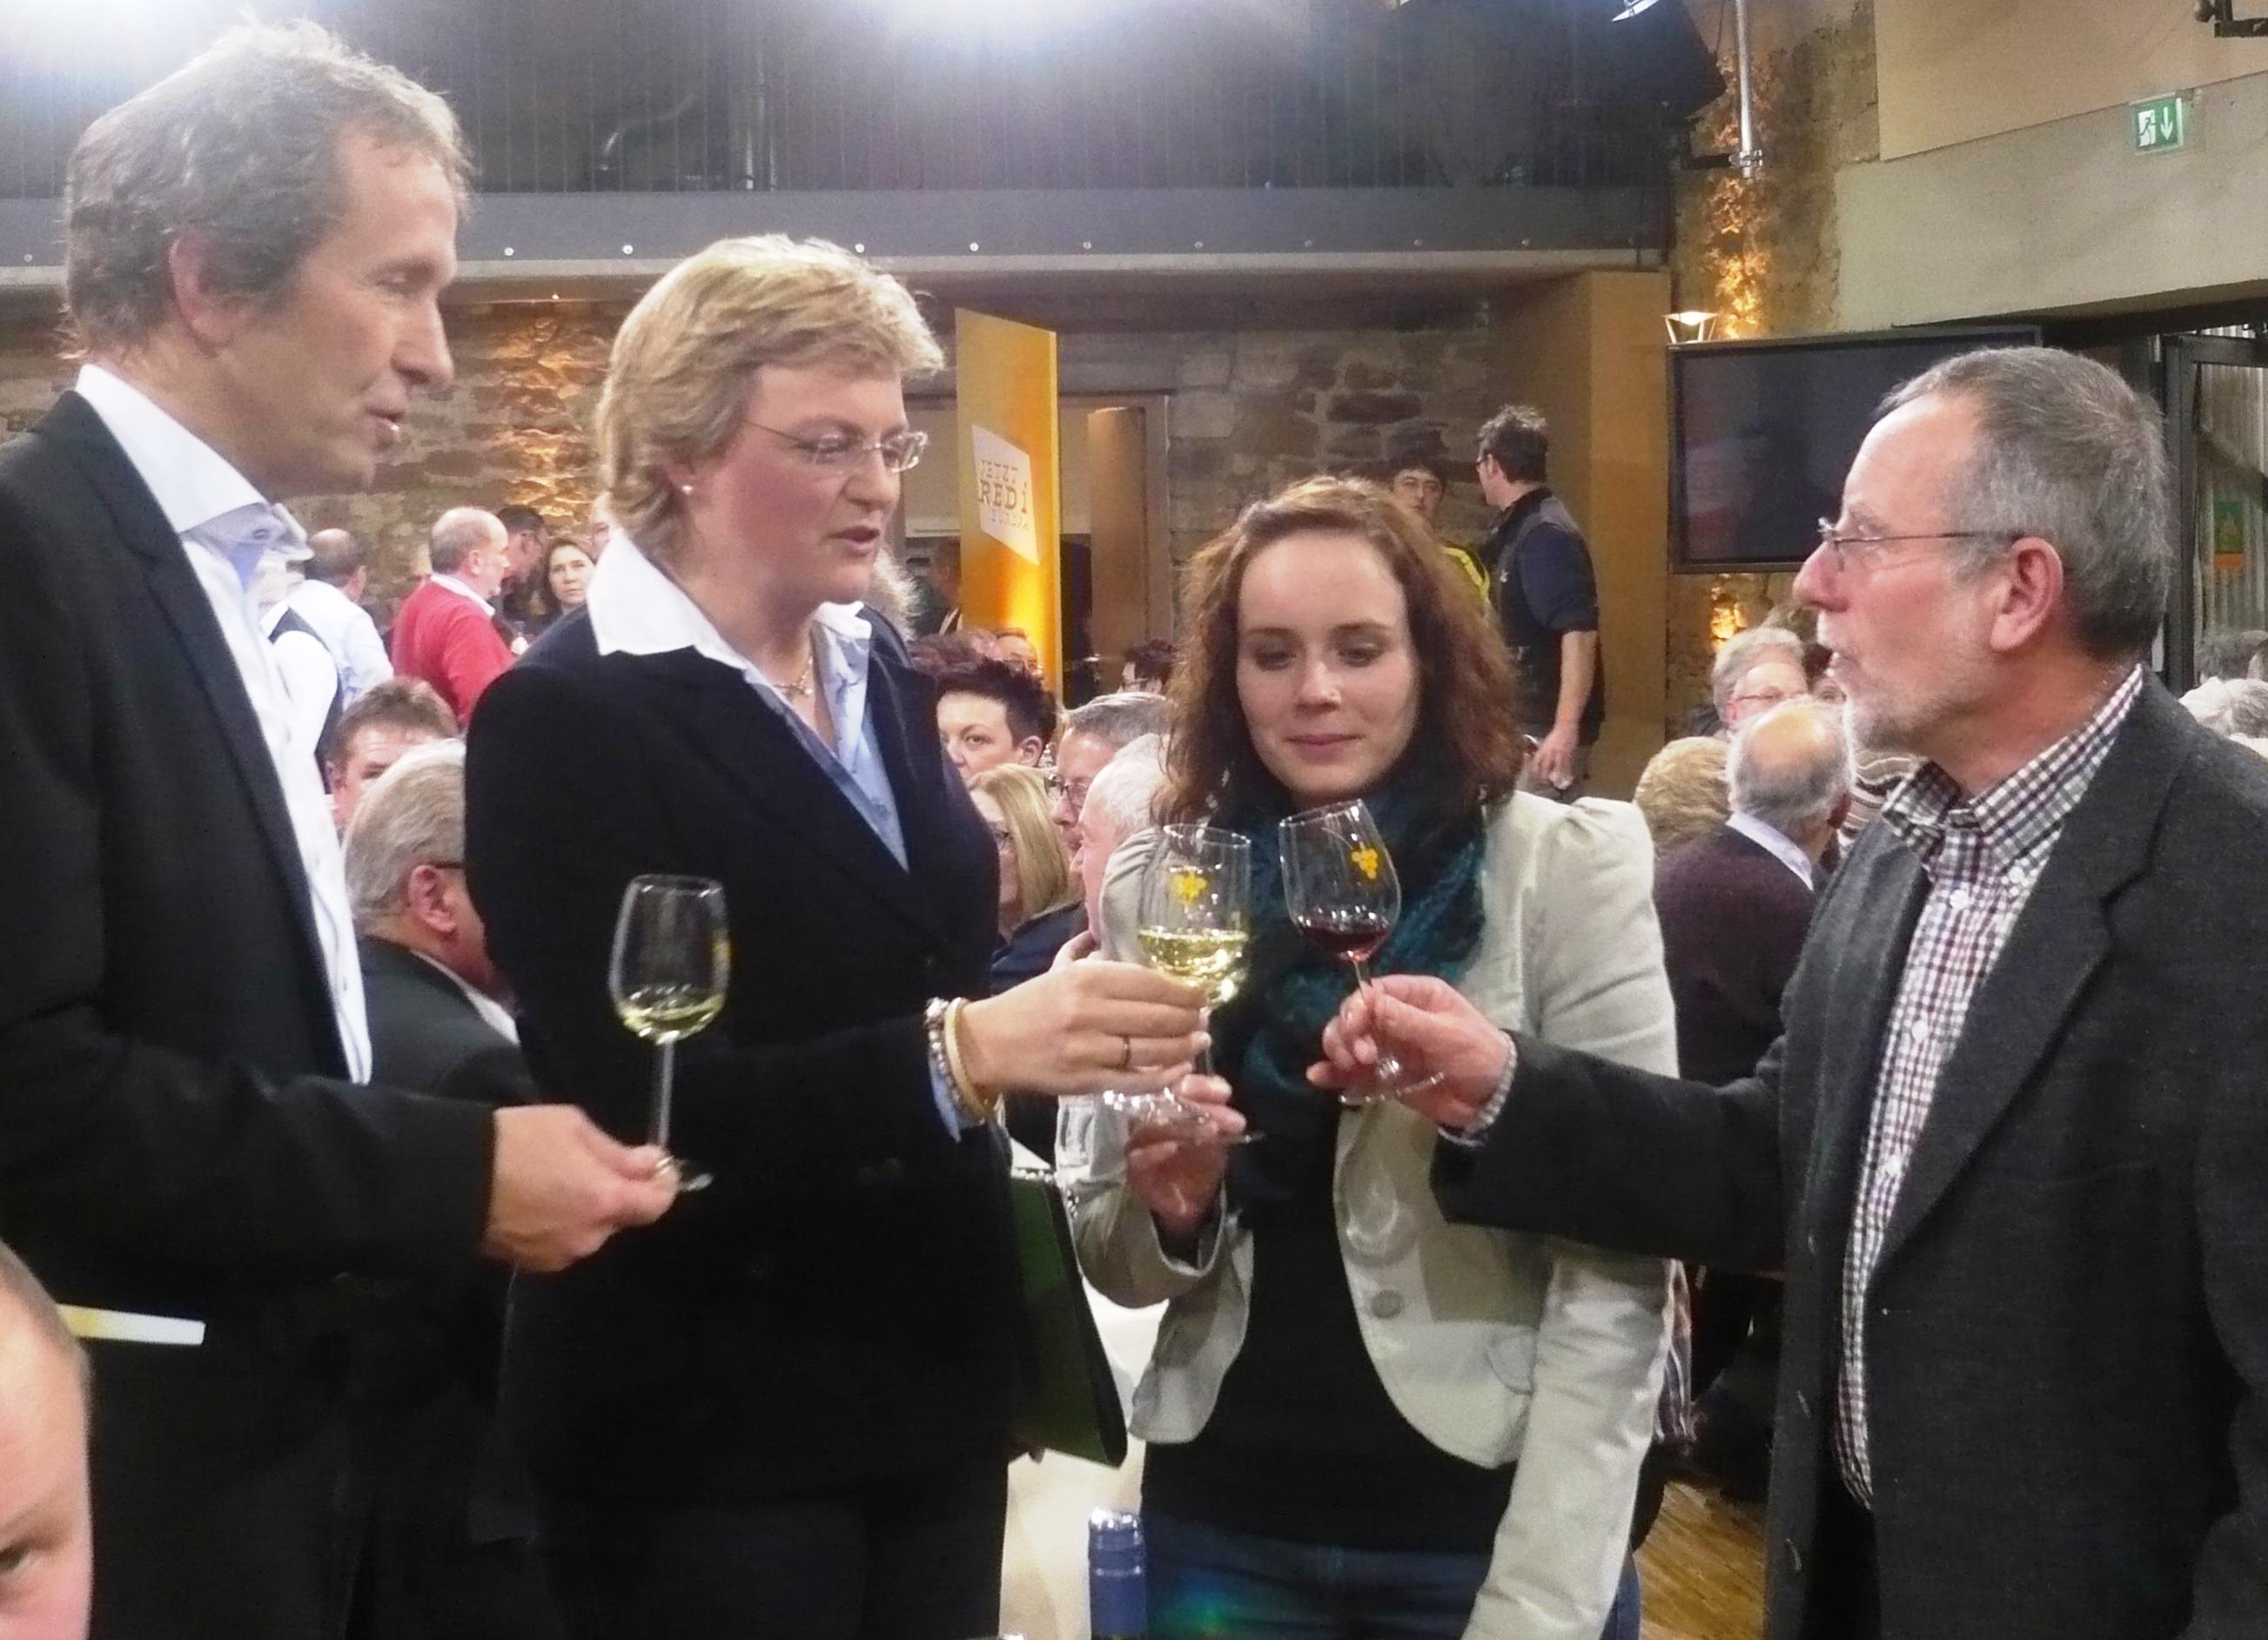 Moderator Schöberl, M. Hohlmeier und Fam. Waigand im Gespräch